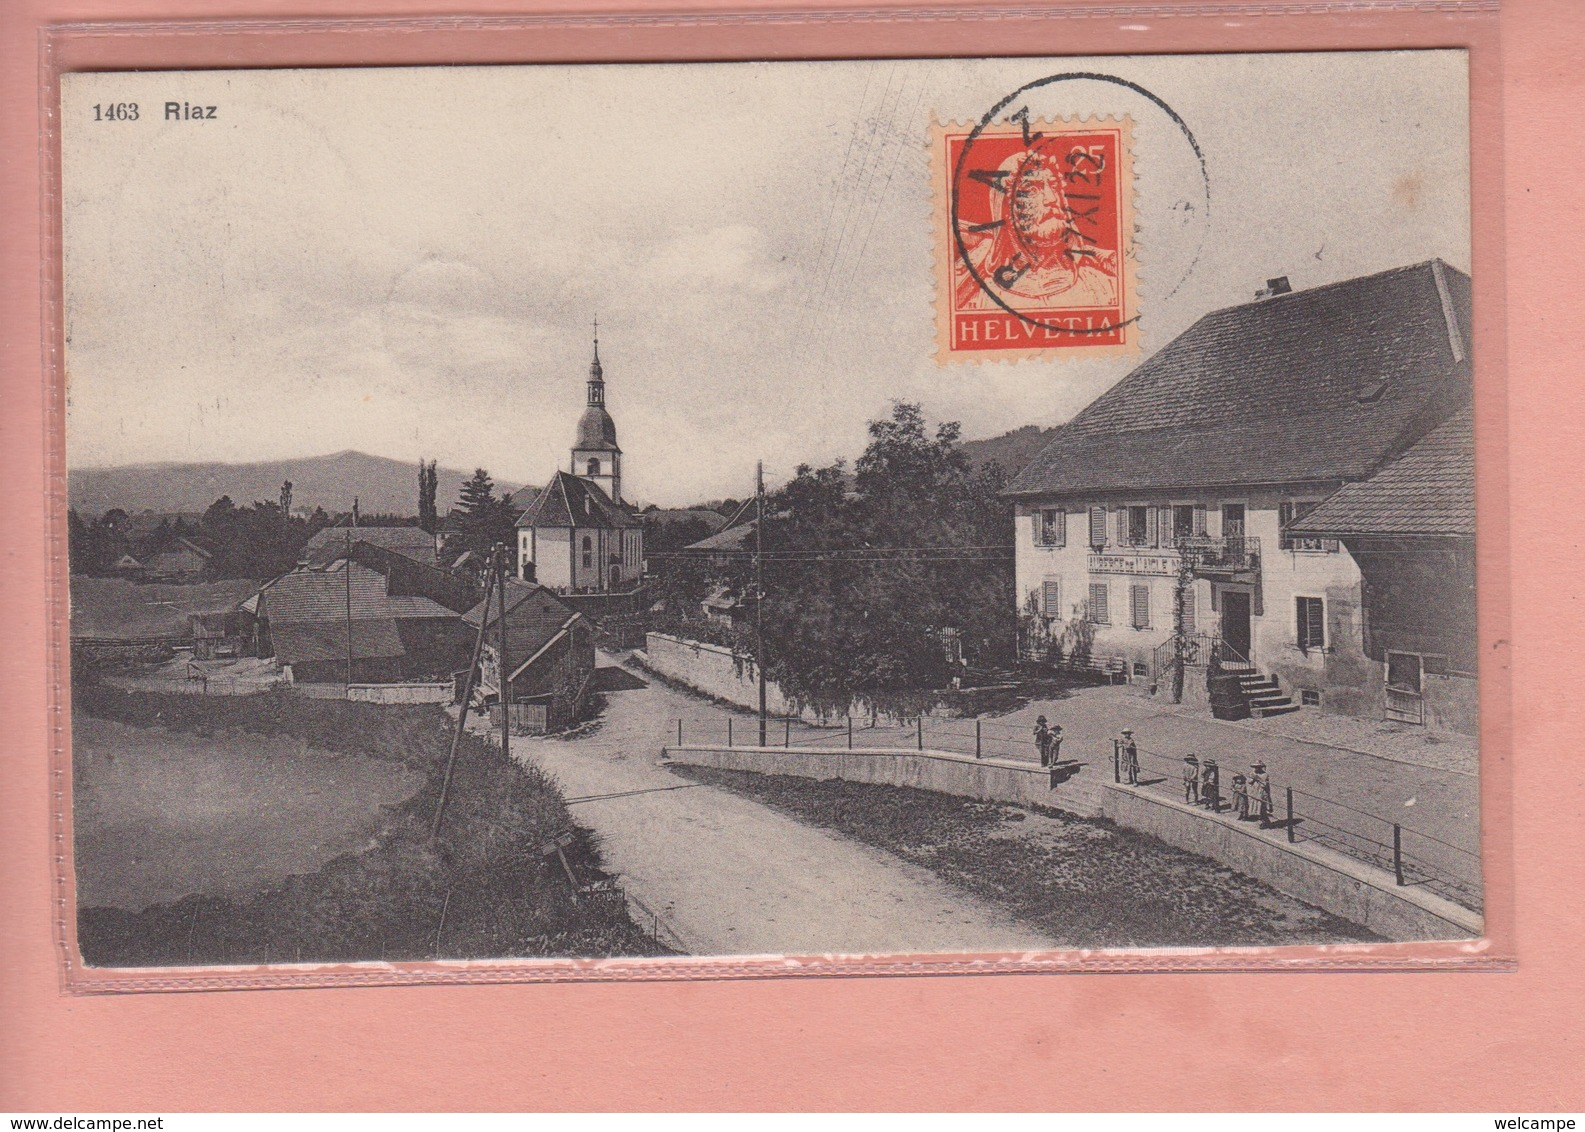 OUDE POSTKAART ZWITSERLAND - SCHWEIZ -  SUISSE -  RIAZ - GEANIMEERD - AUBERGE - FR Fribourg